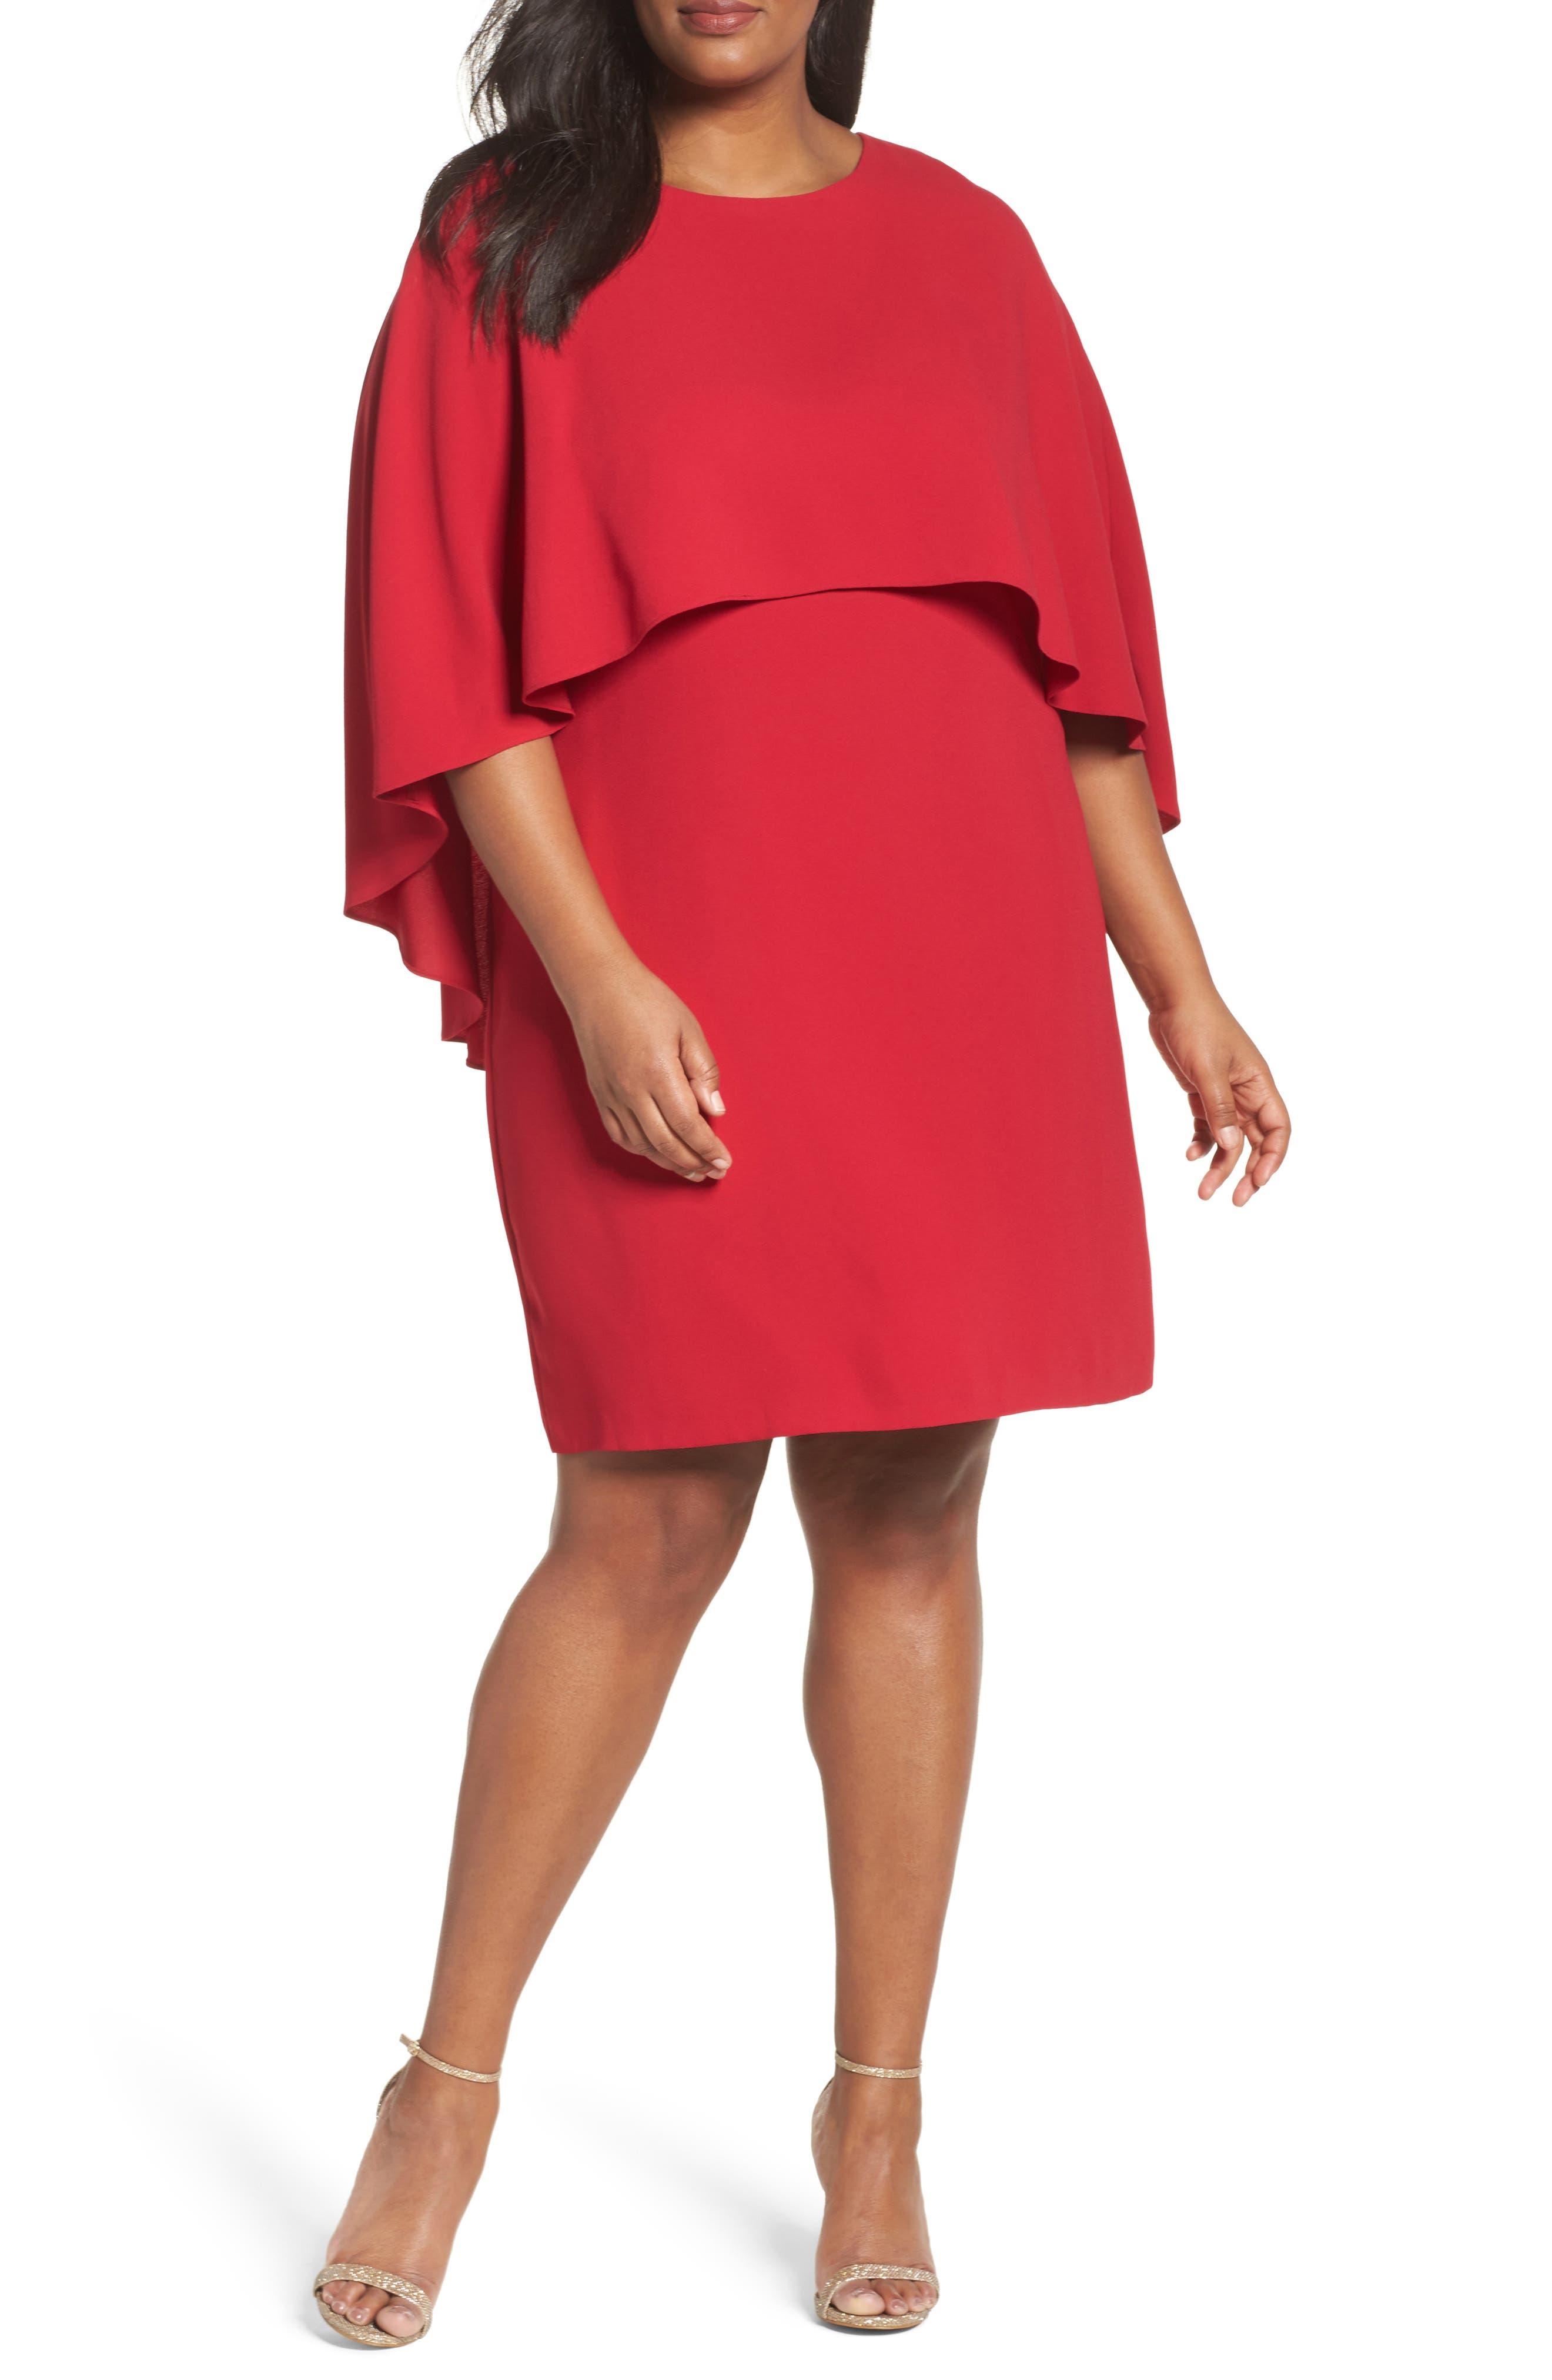 Vince Camuto Matte Shine Overlay Dress (Plus Size)